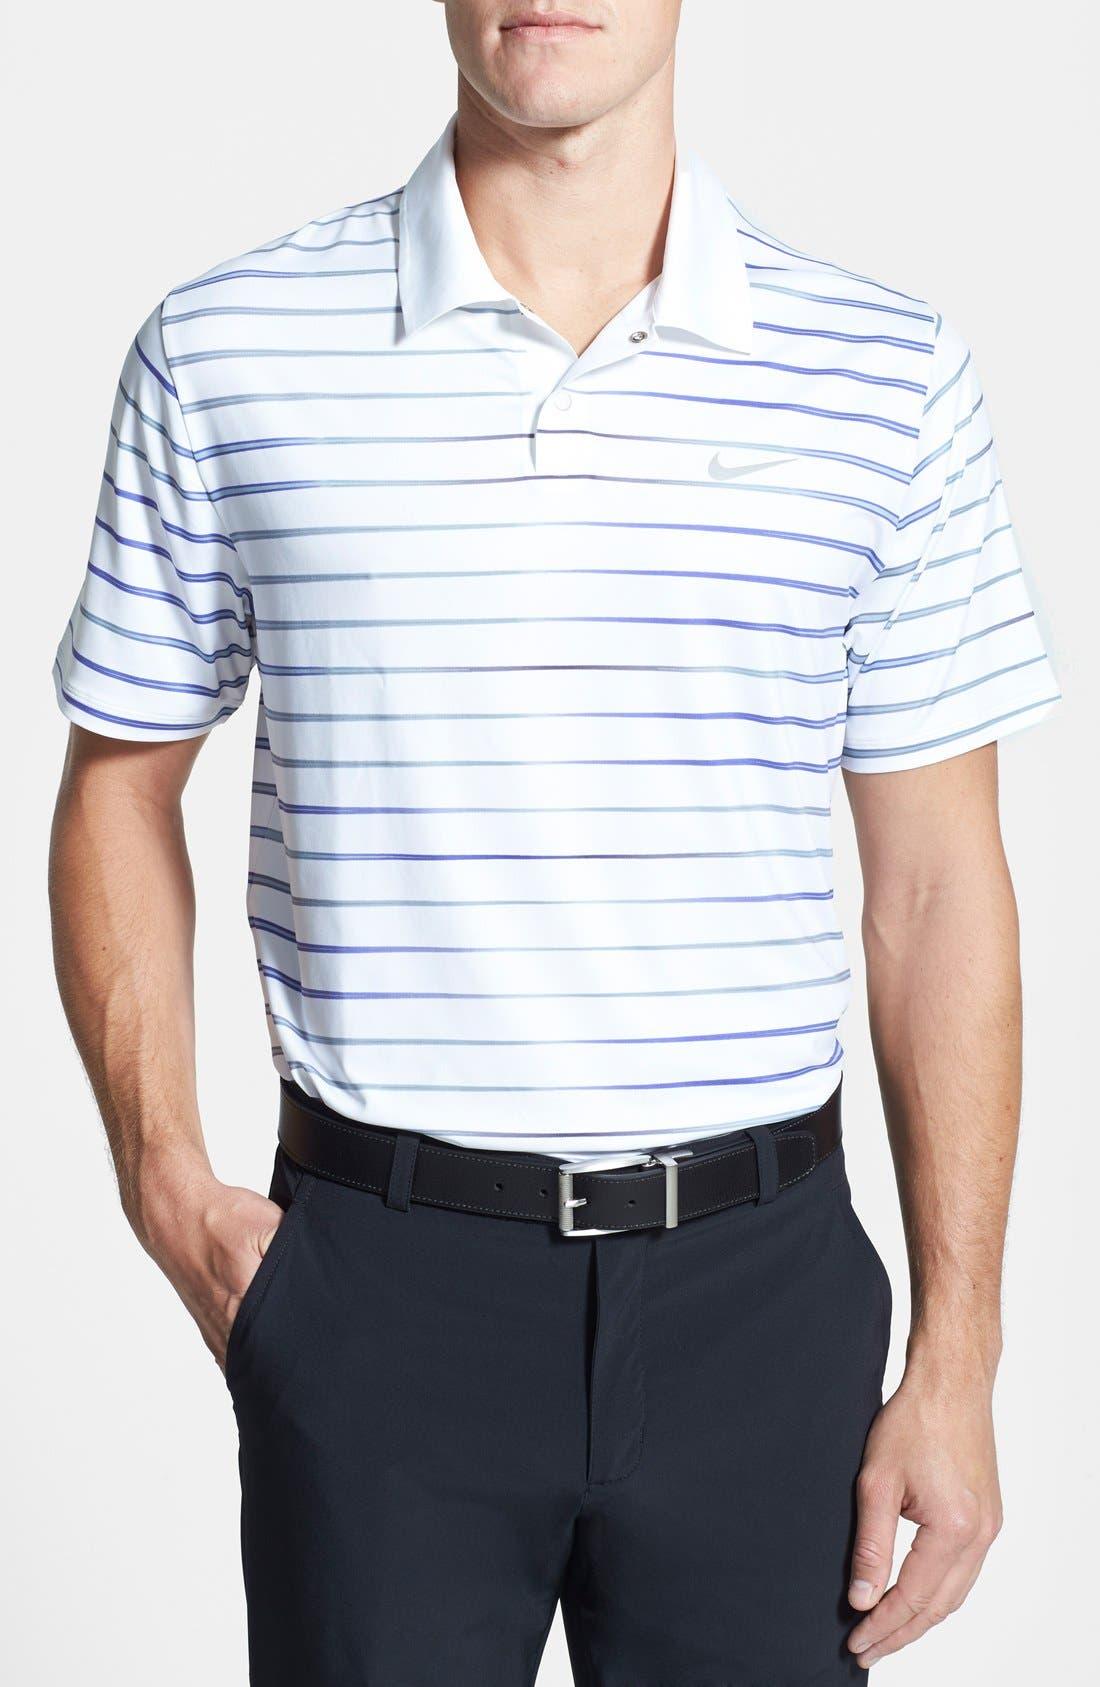 Alternate Image 1 Selected - Nike 'TW Iridescent Stripe' Dri-FIT Polo